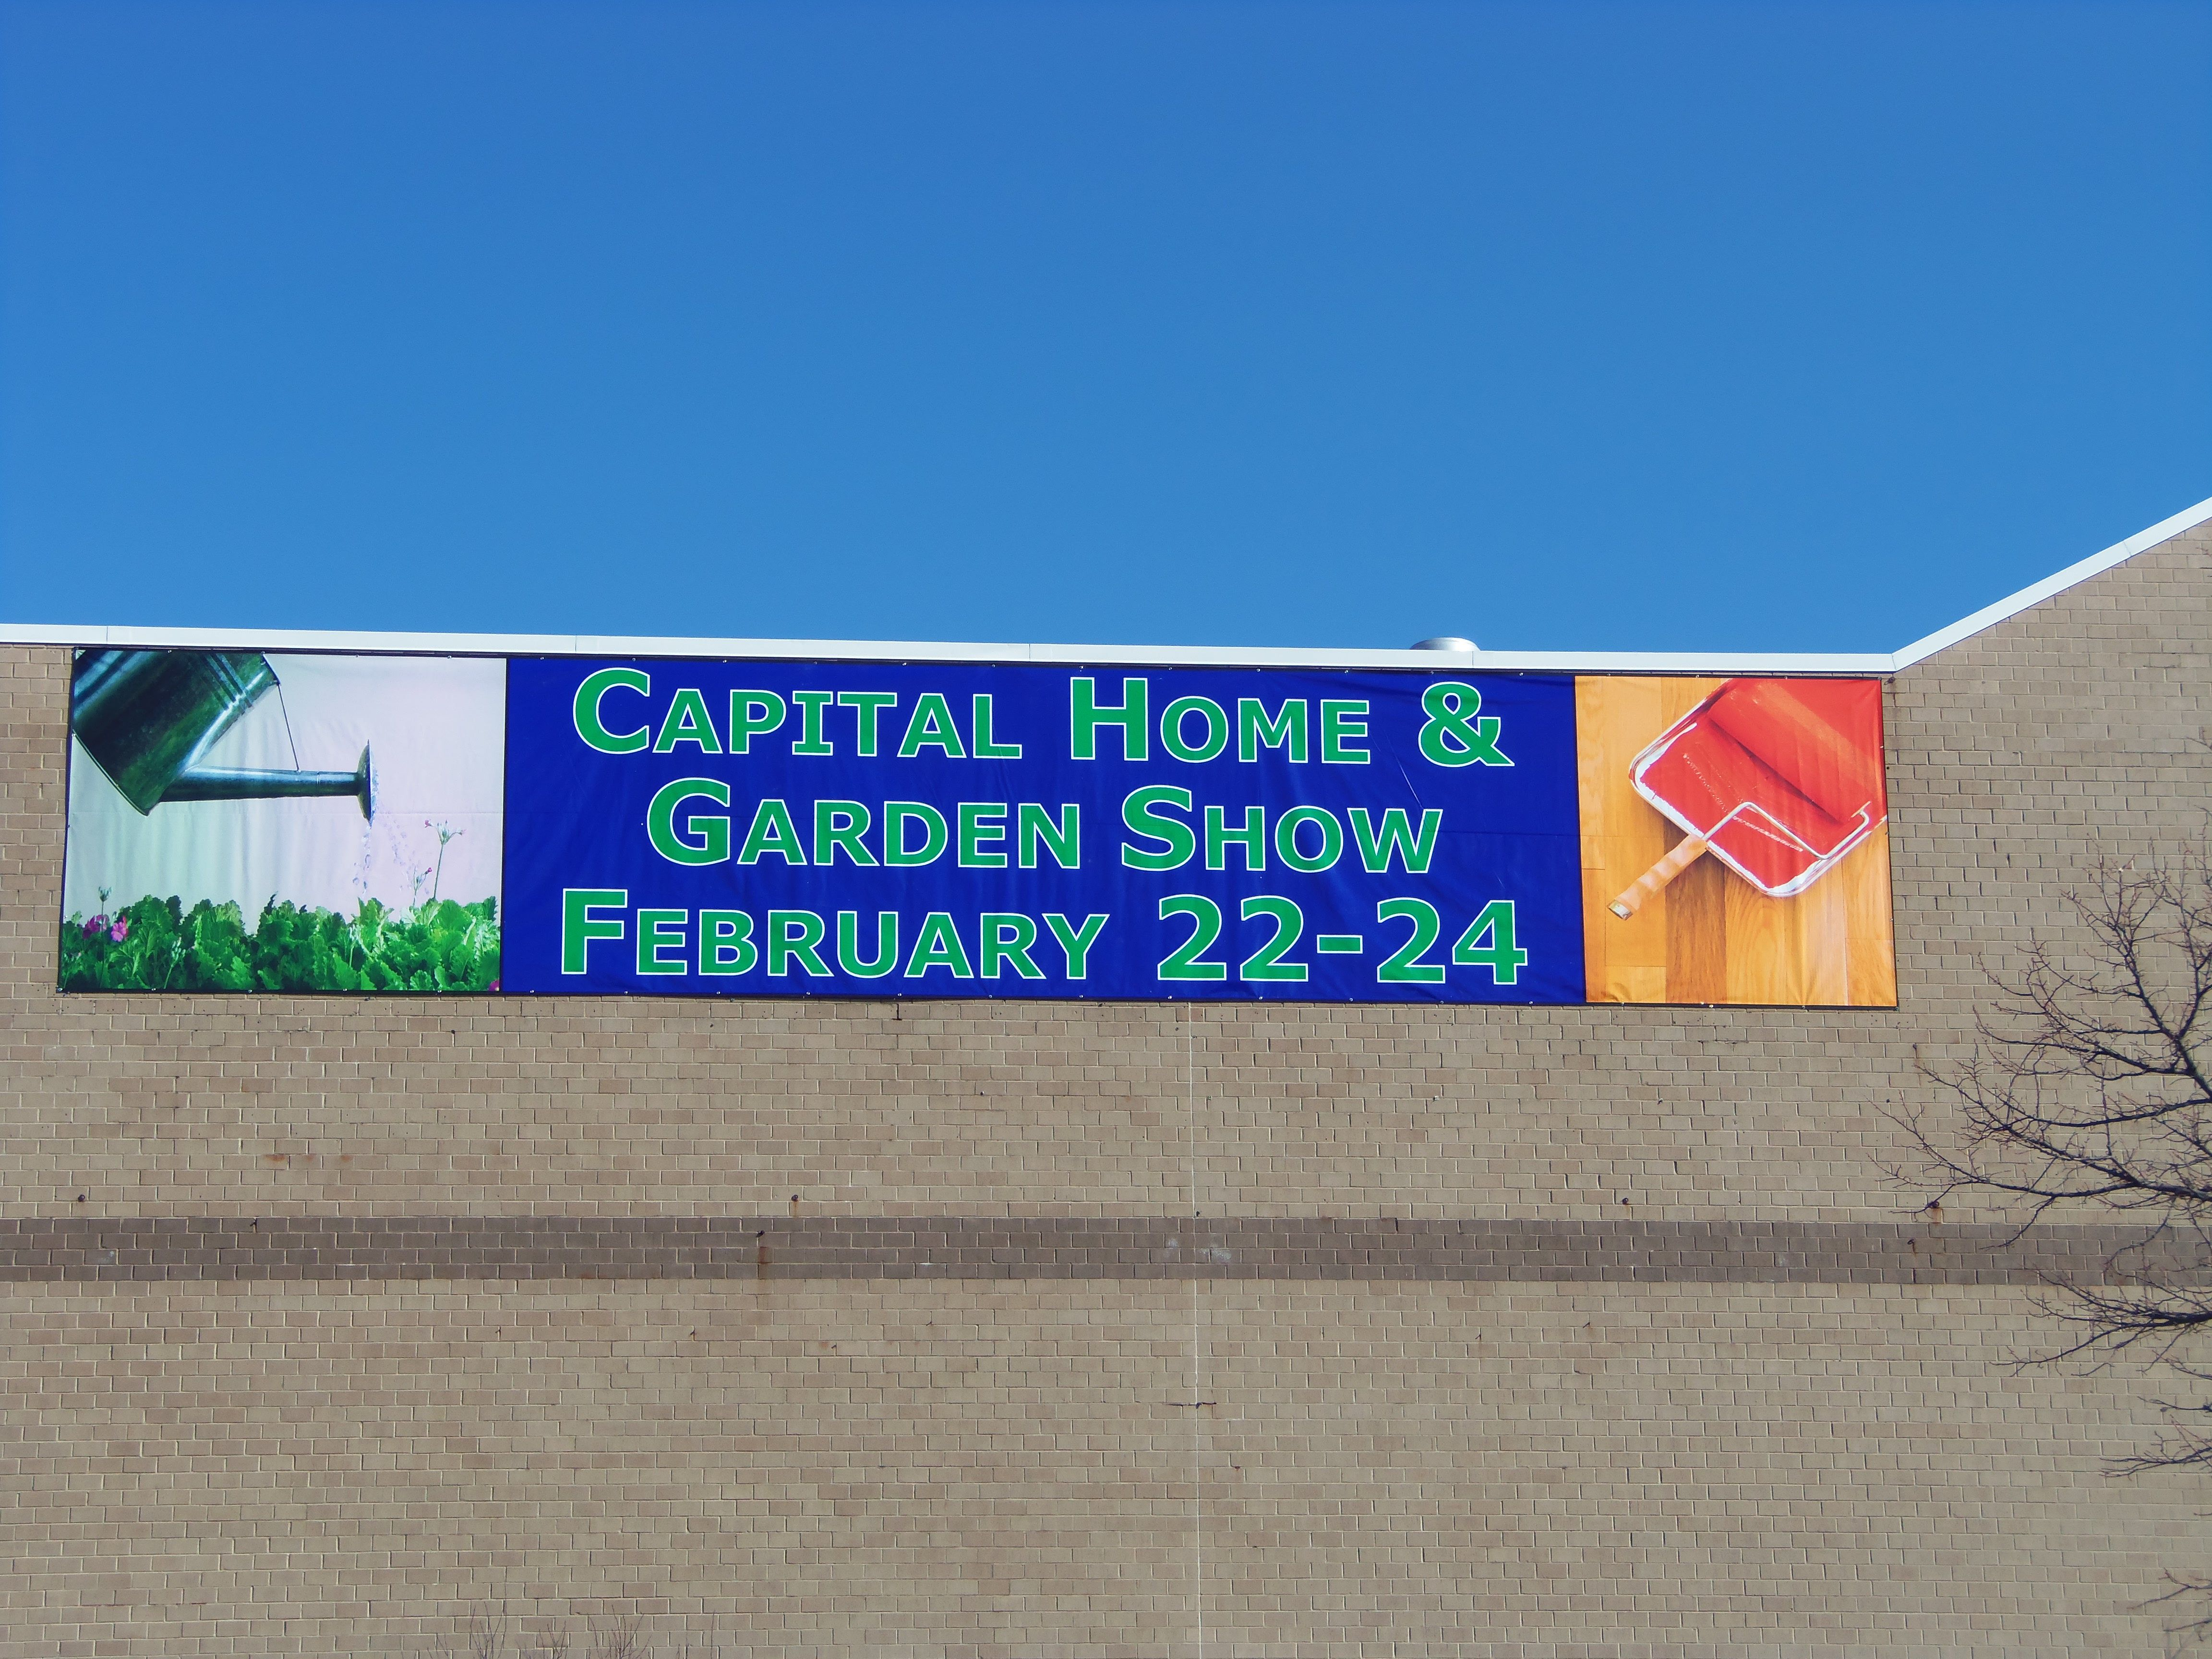 Capitol Home And Garden Show  Dulles Expo Center